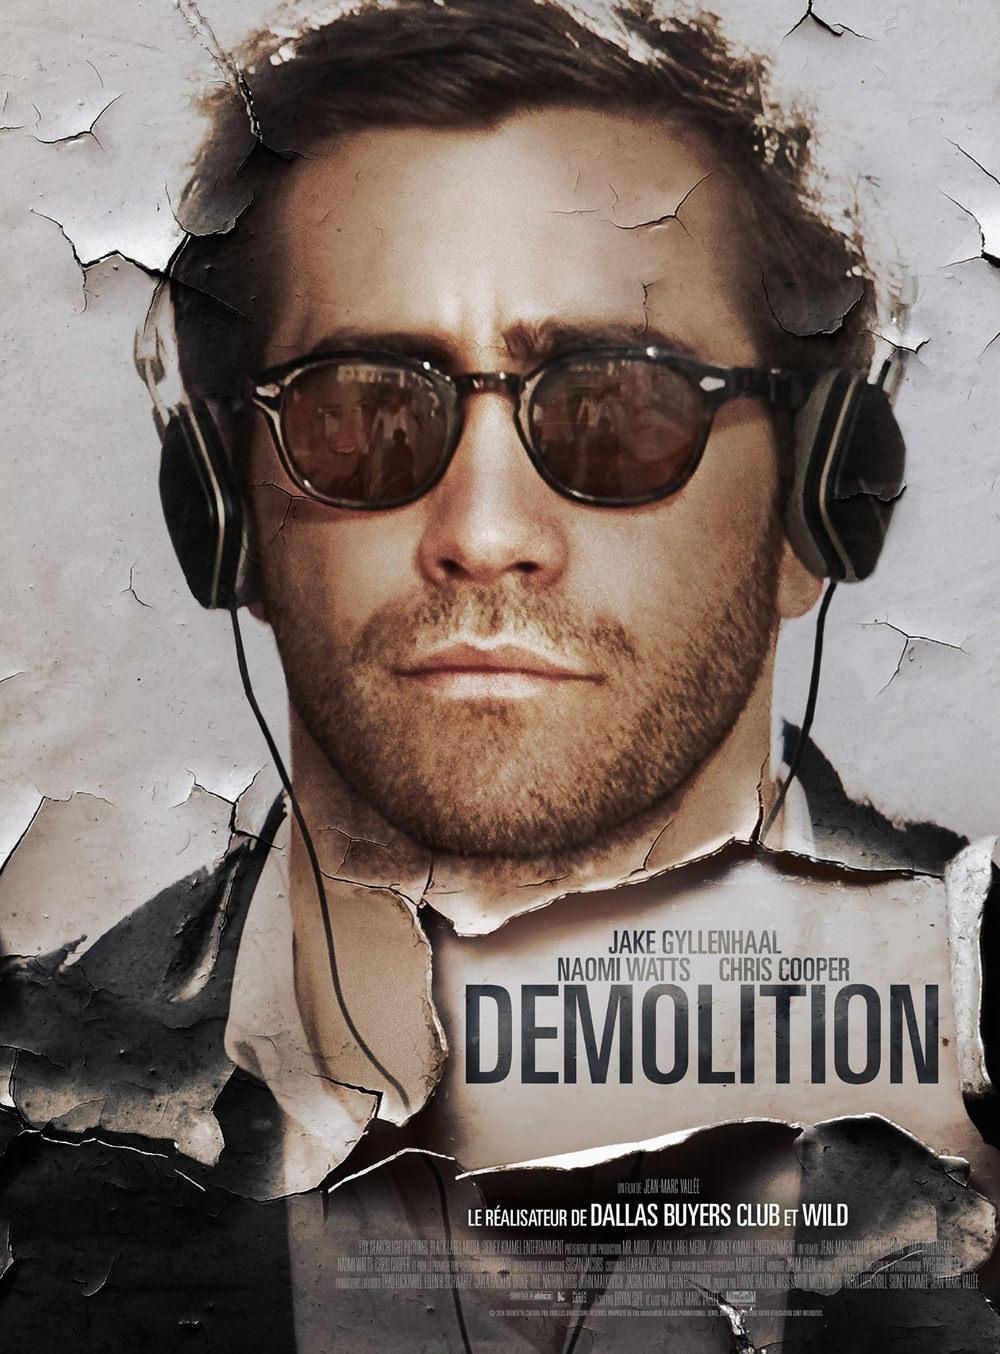 Blog-Mode-And-The-City-Lifestyle-Cinq-Petites-Choses-175-film-Demolition